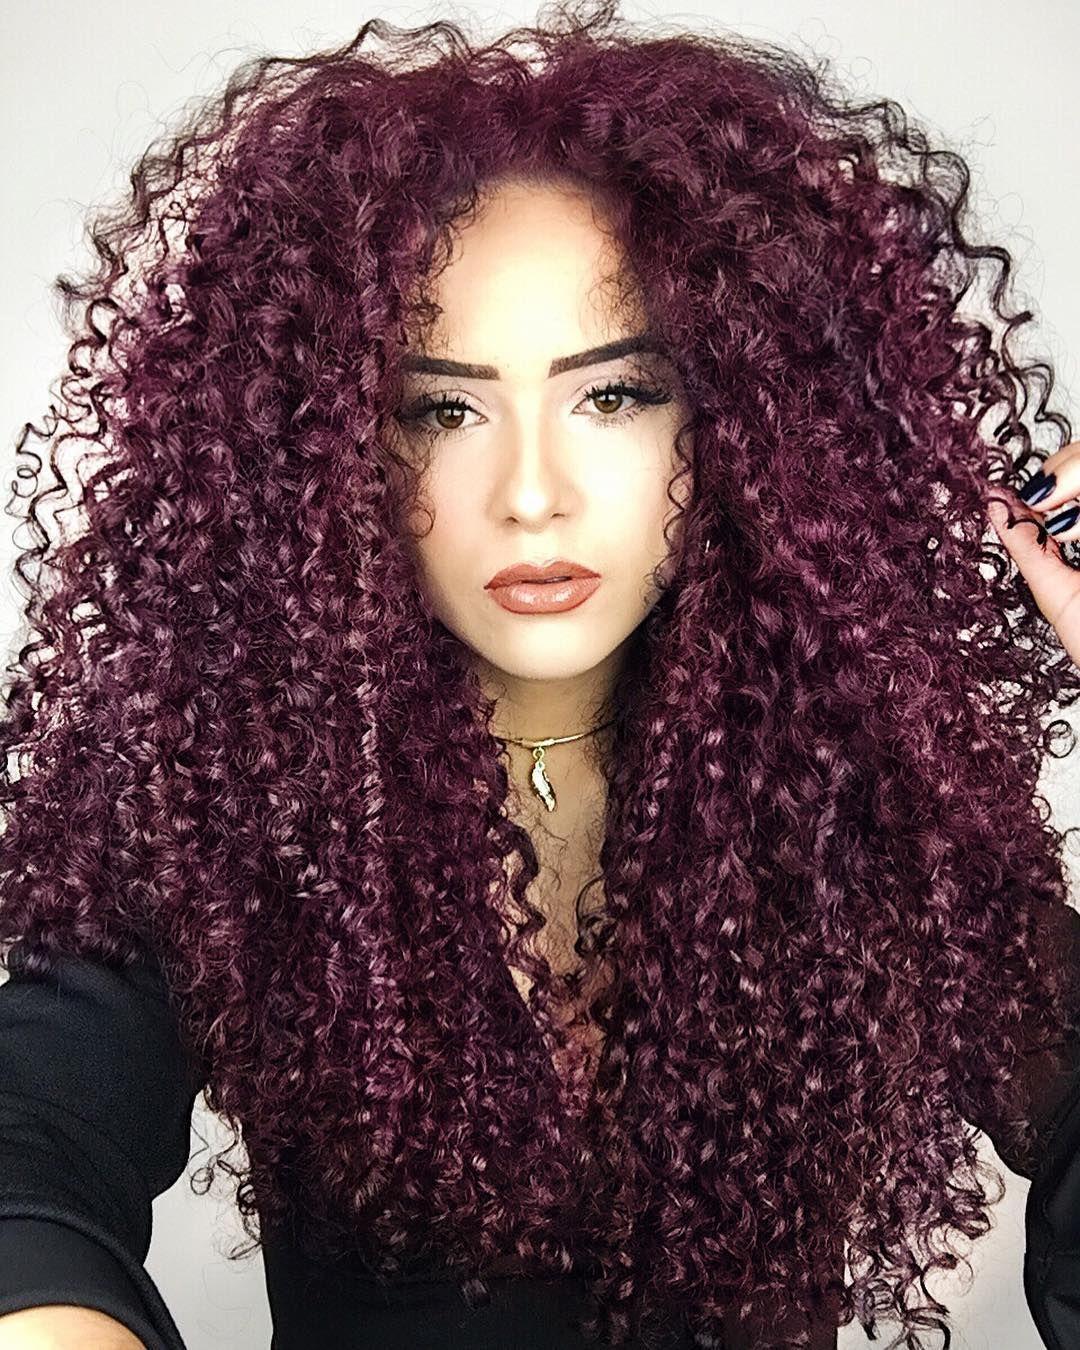 Cores de cabelo 80 tendências para todos os tipos de